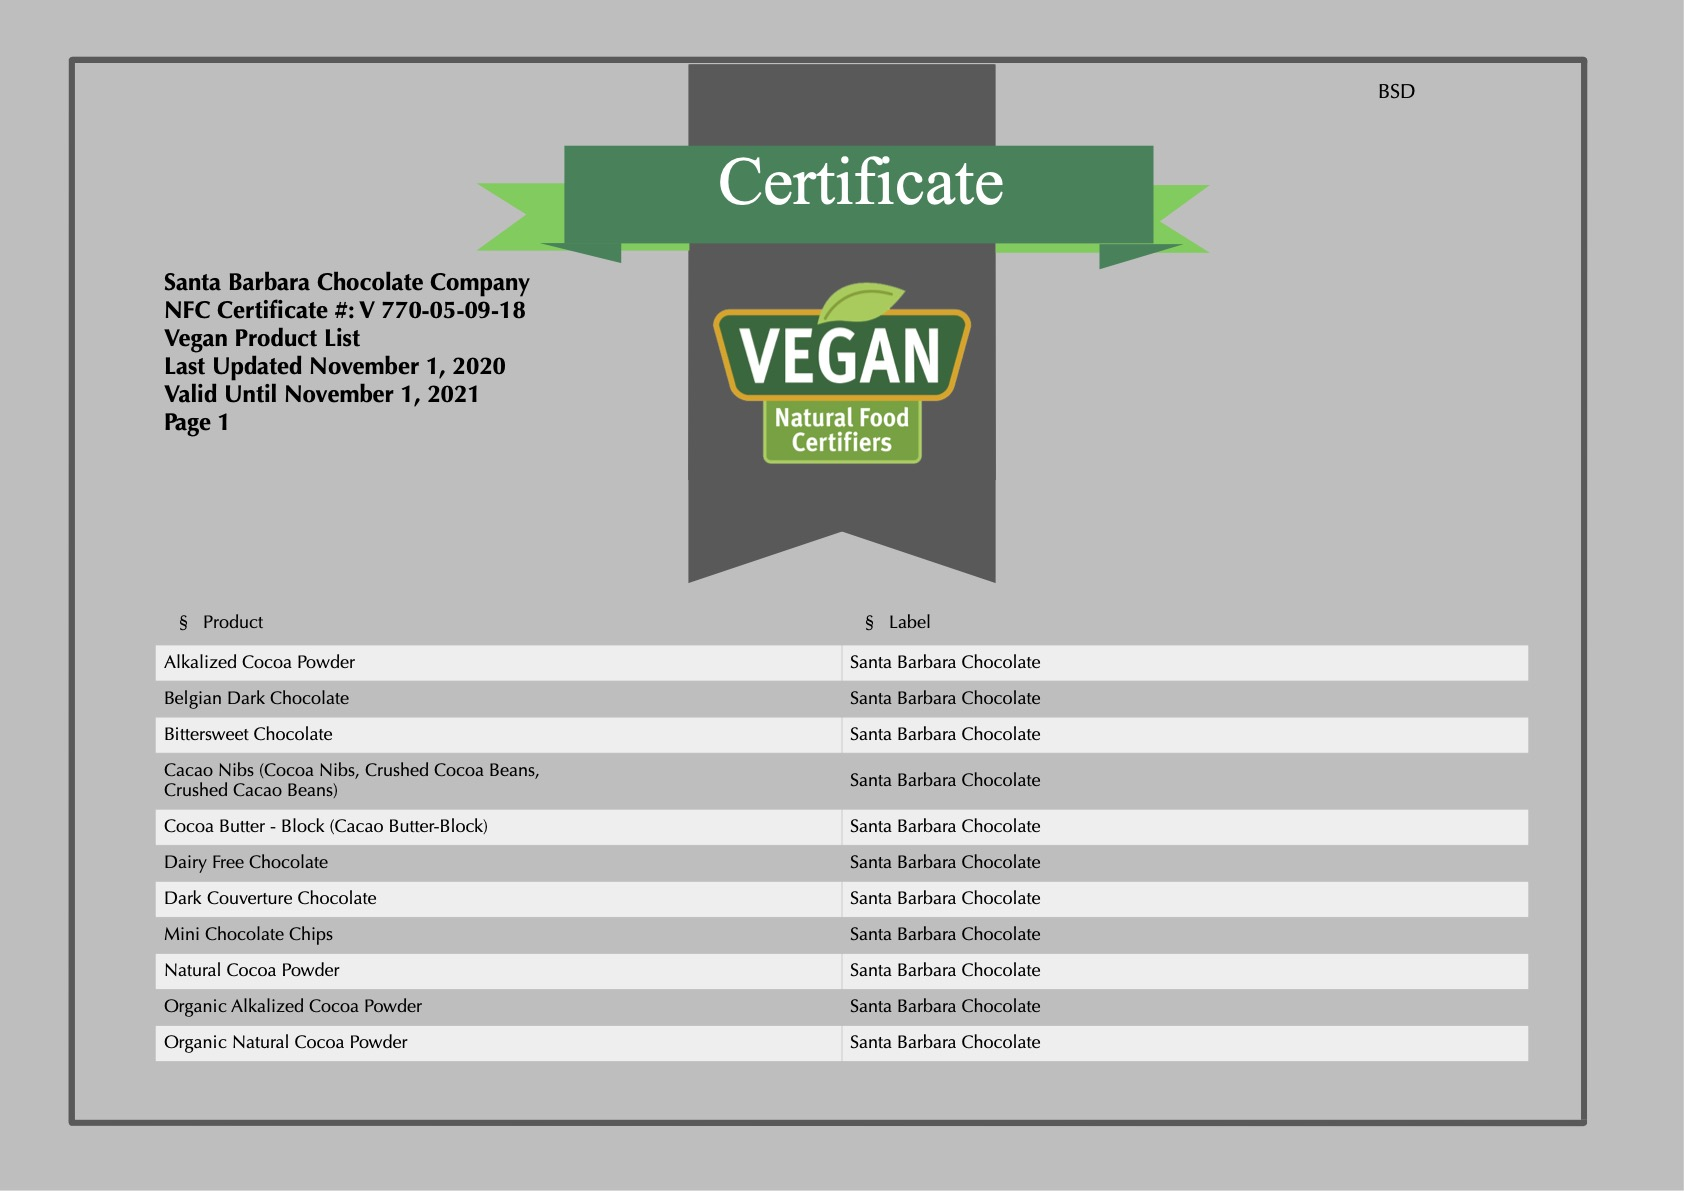 santa-barbara-chocolate-vegan-cer-2021signed-.jpg